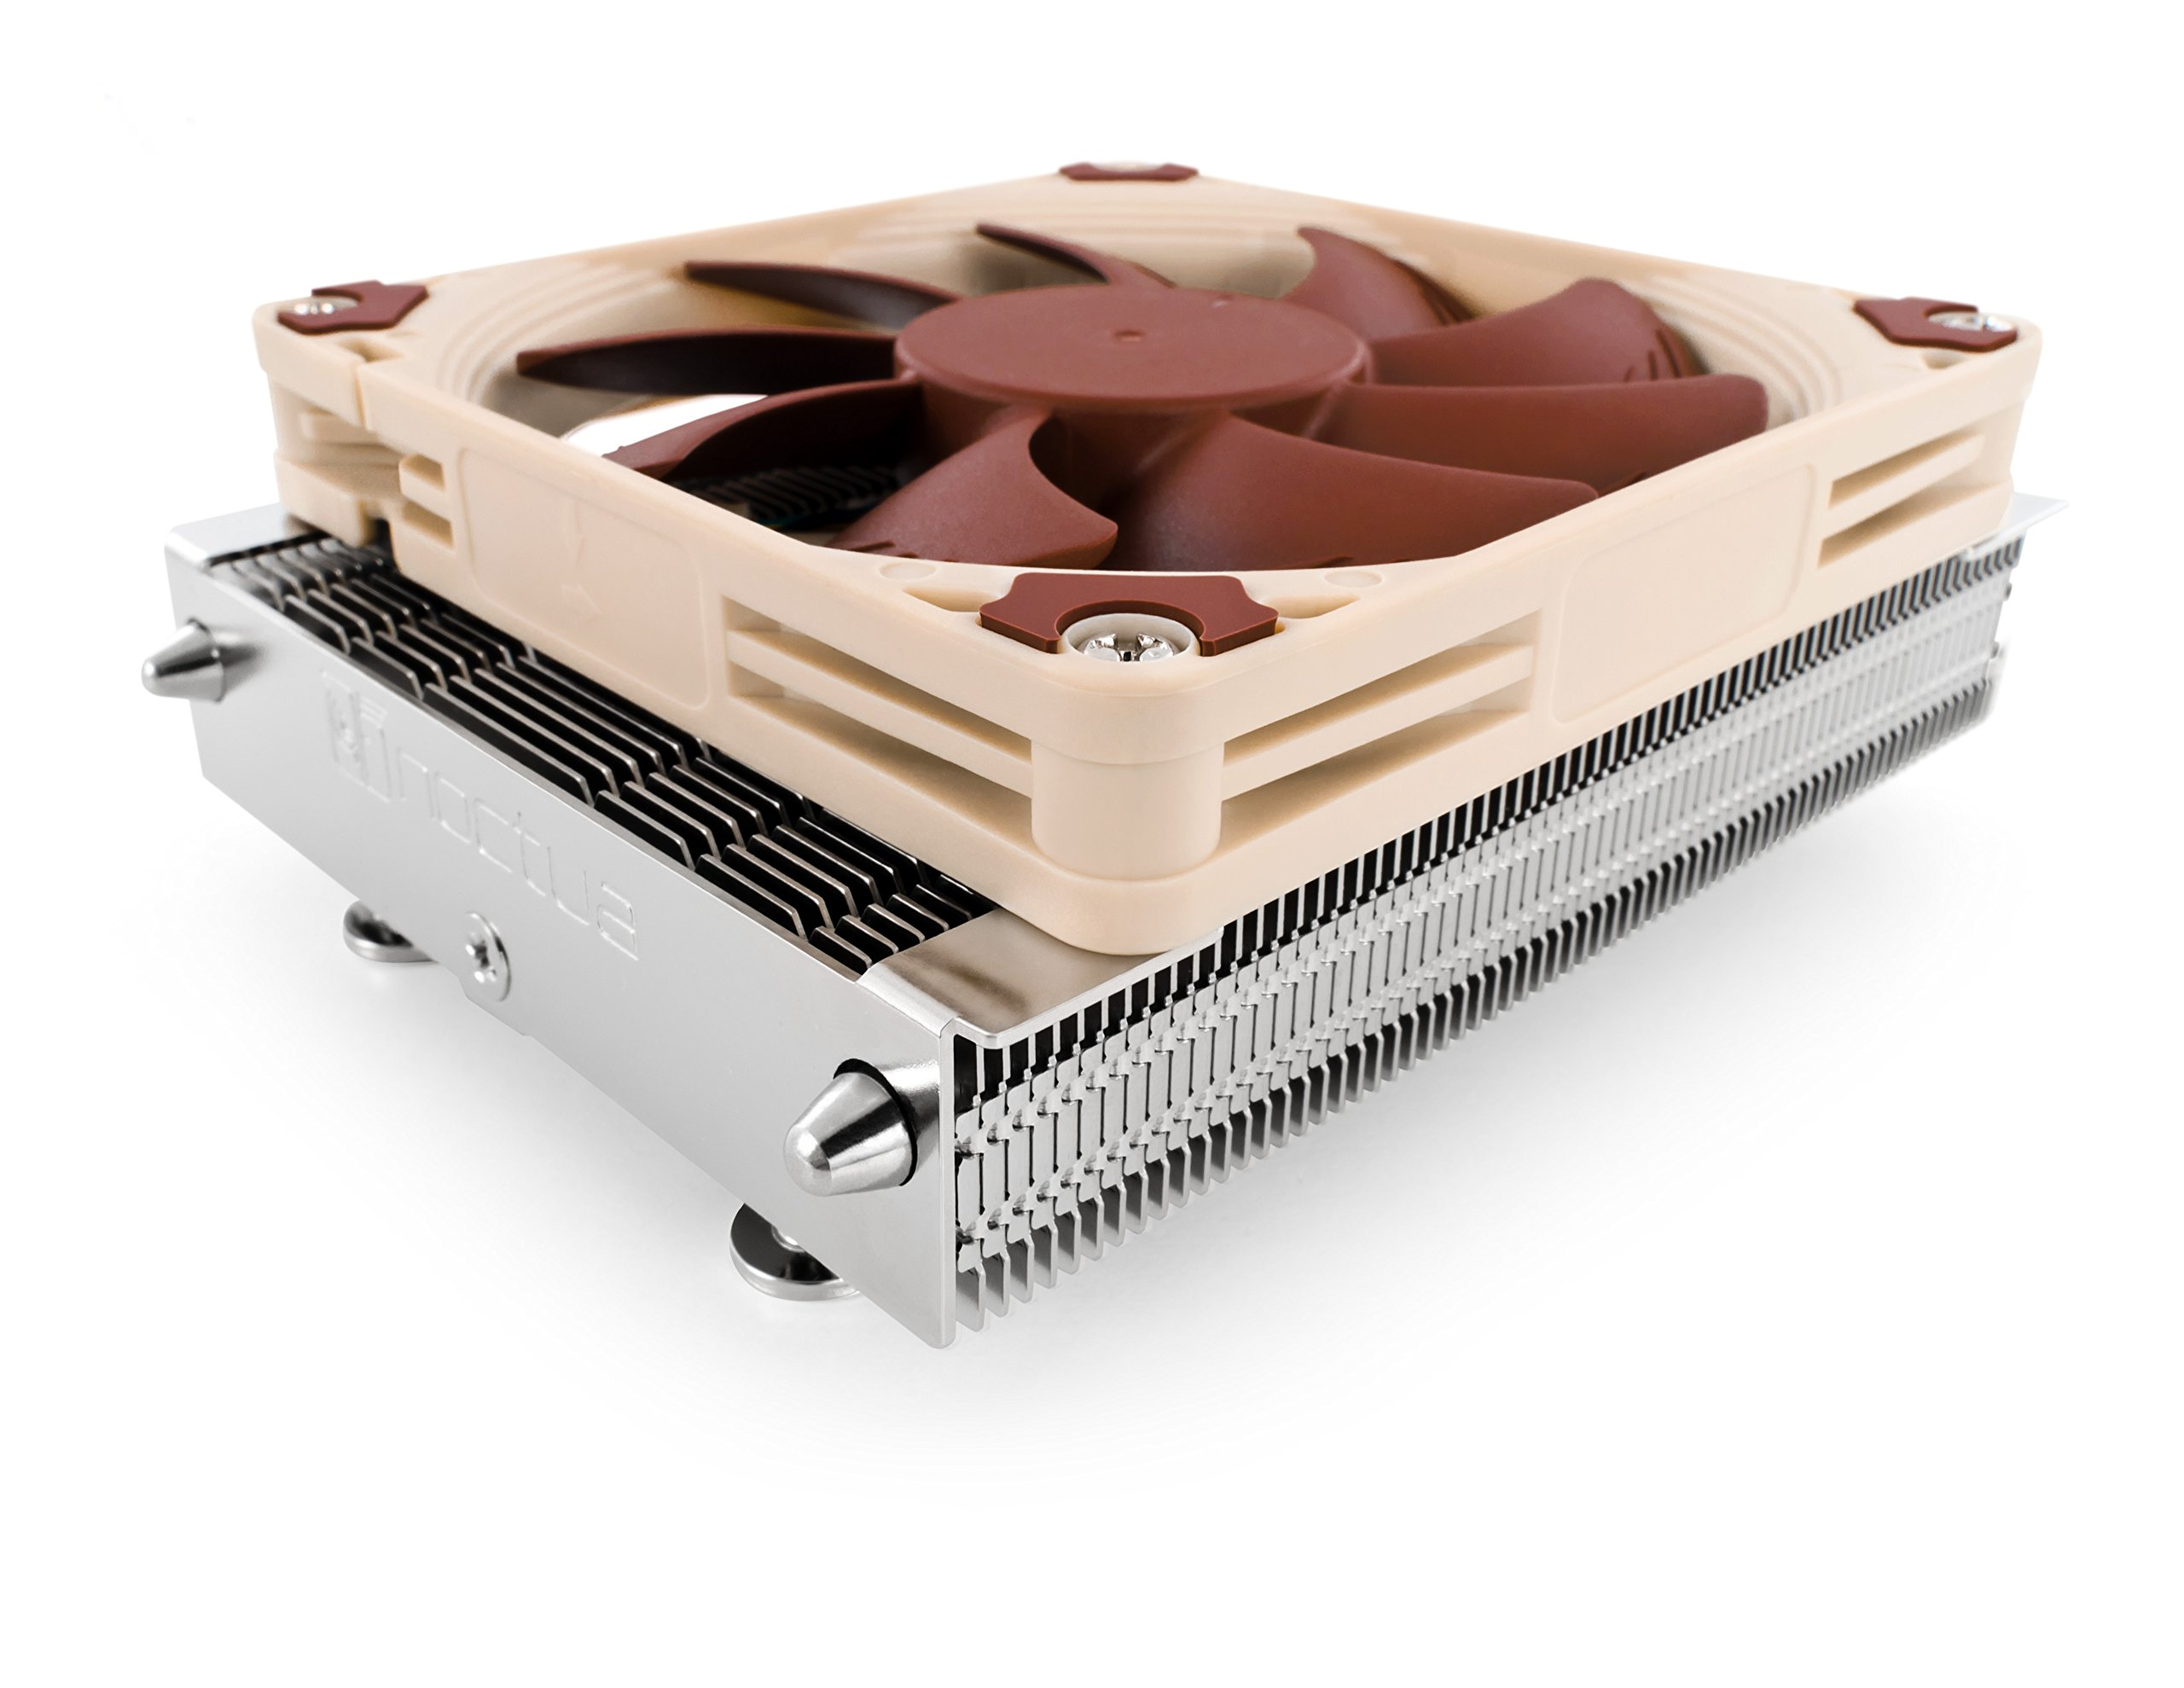 Noctua NH-L9a AM4, 37mm Premium Low-profile CPU Cooler for AMD AM4 (Brown) by NOCTUA